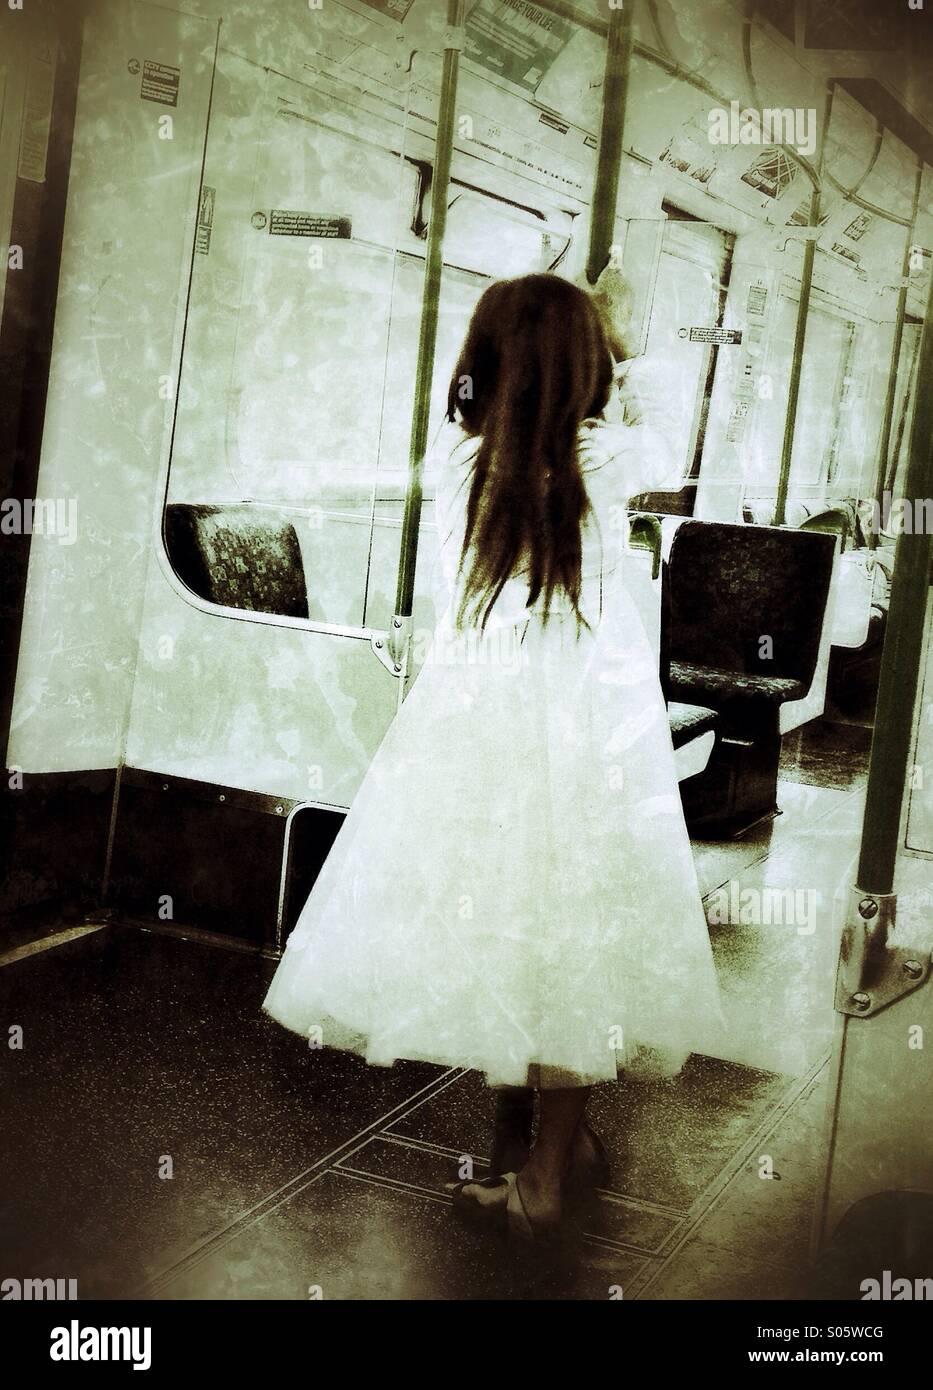 Girl on train - Stock Image